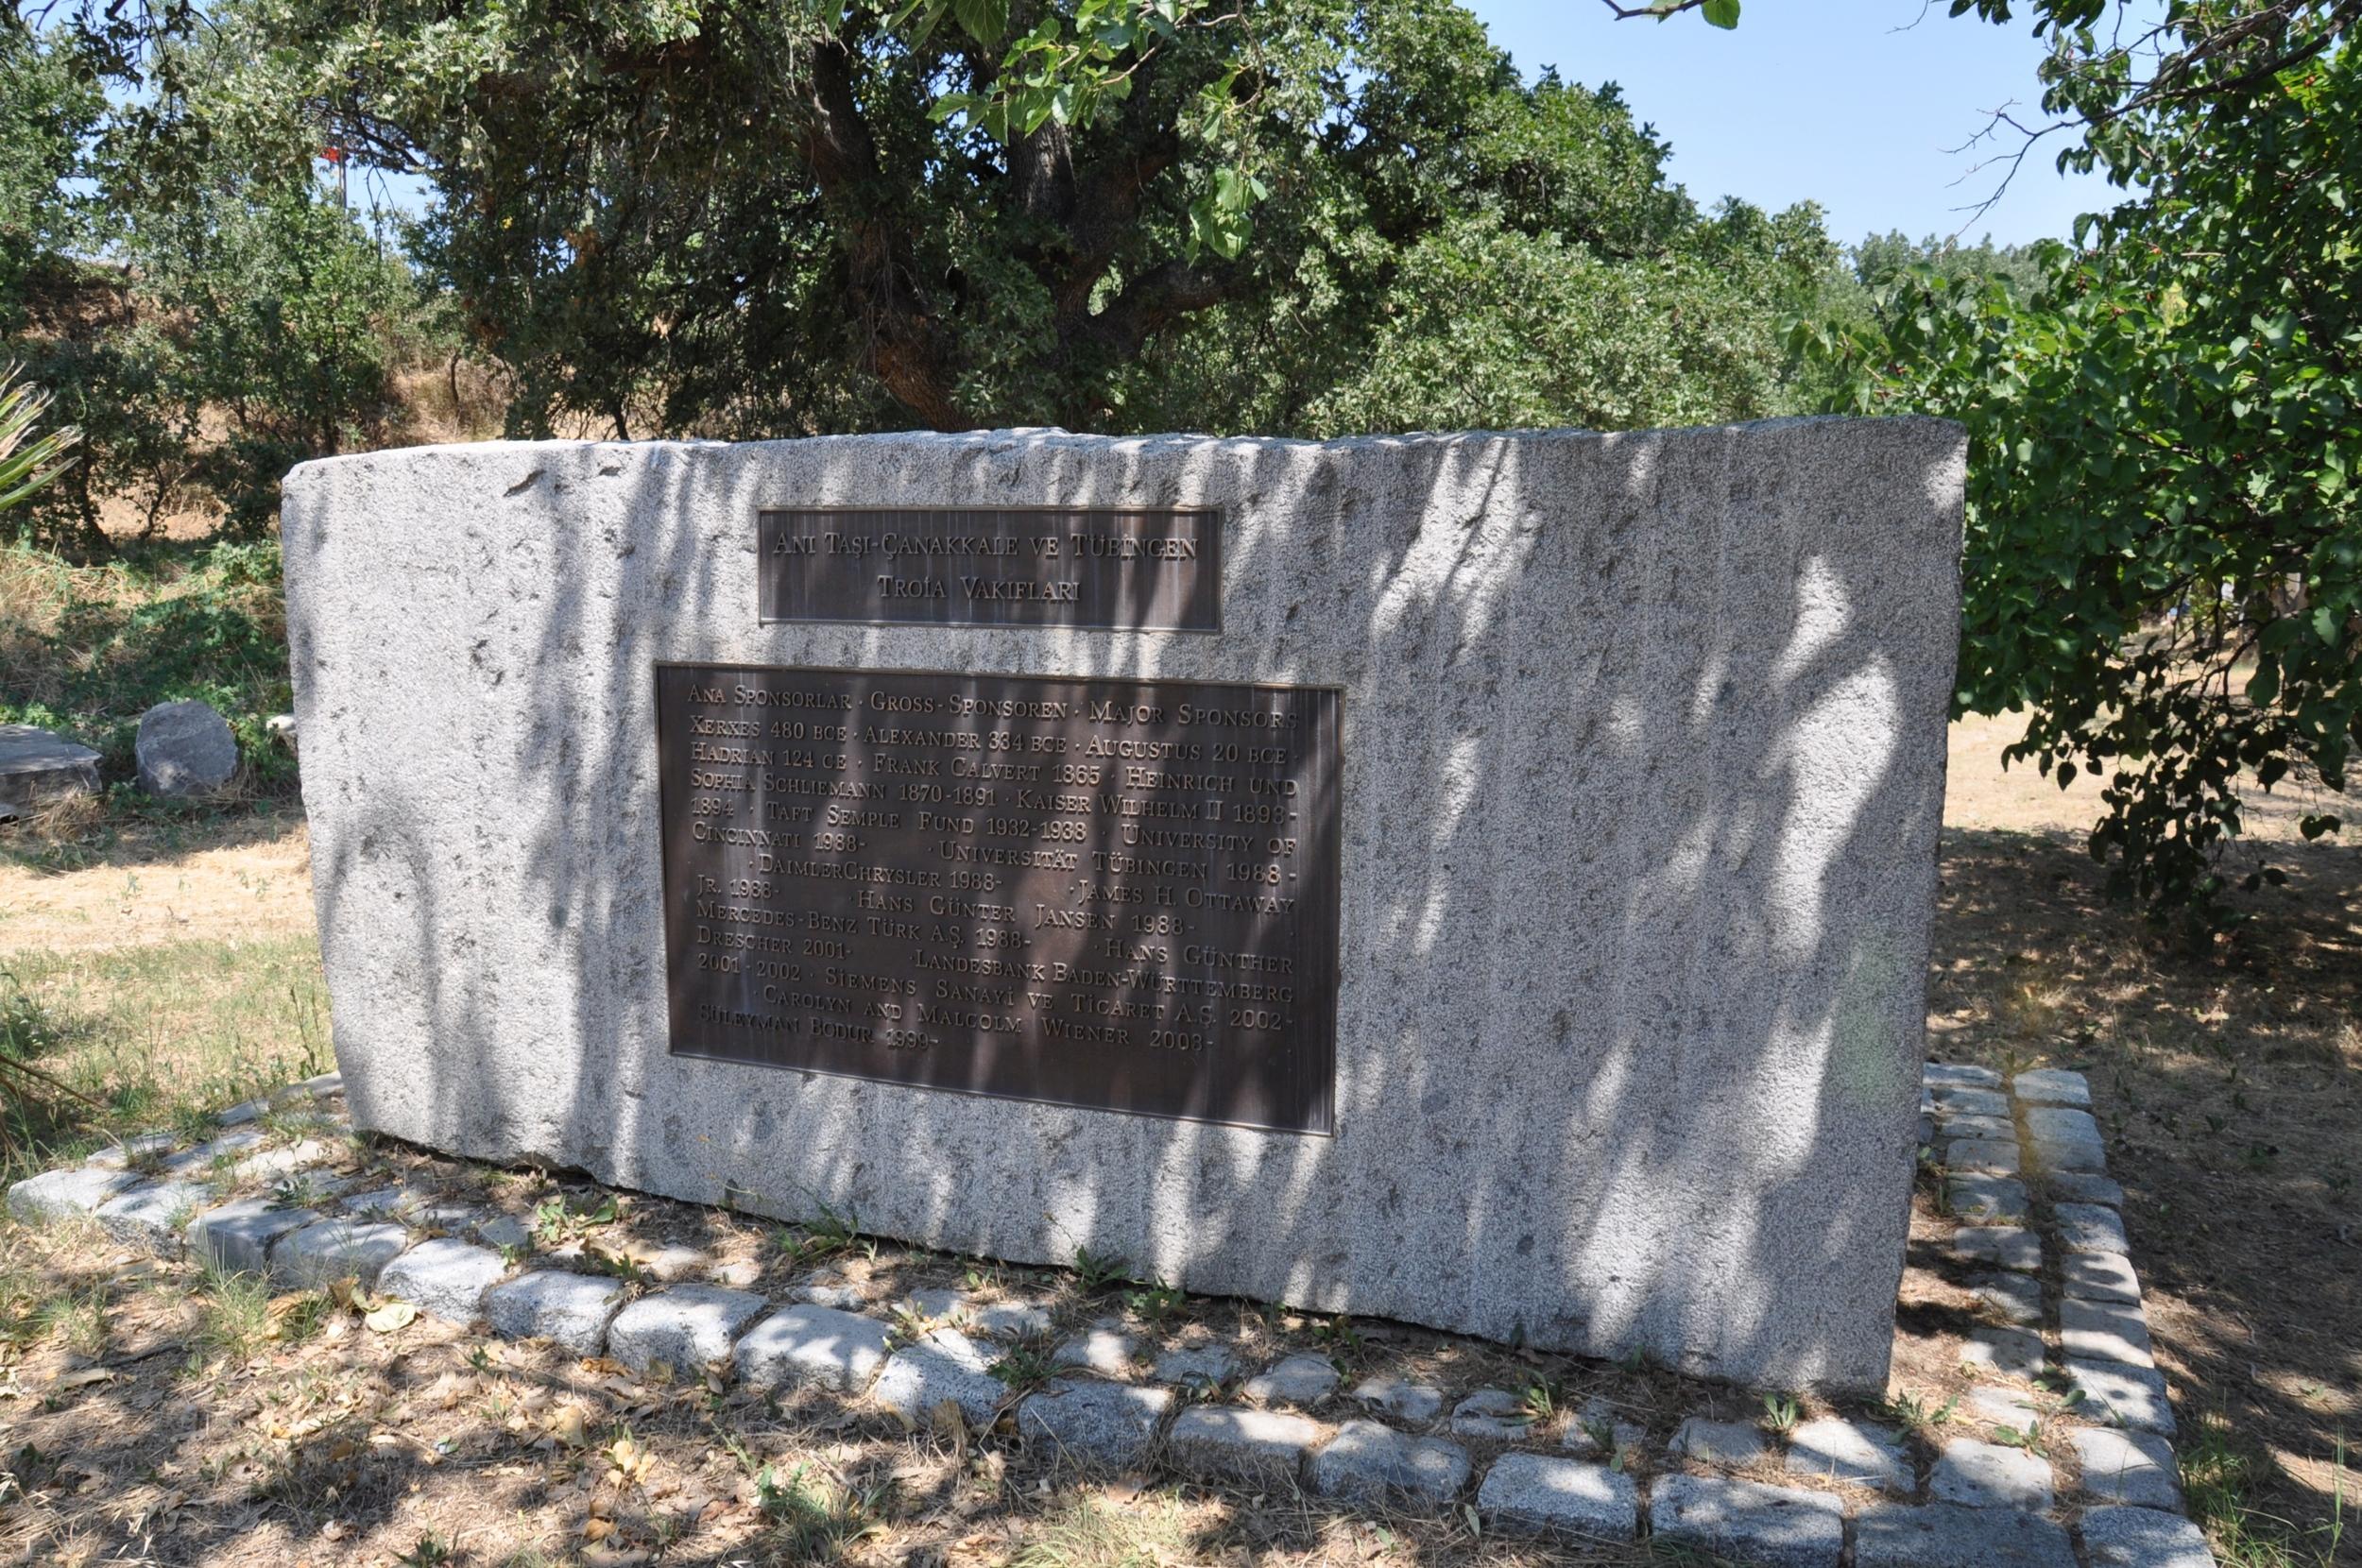 Eternal Stone of Troy